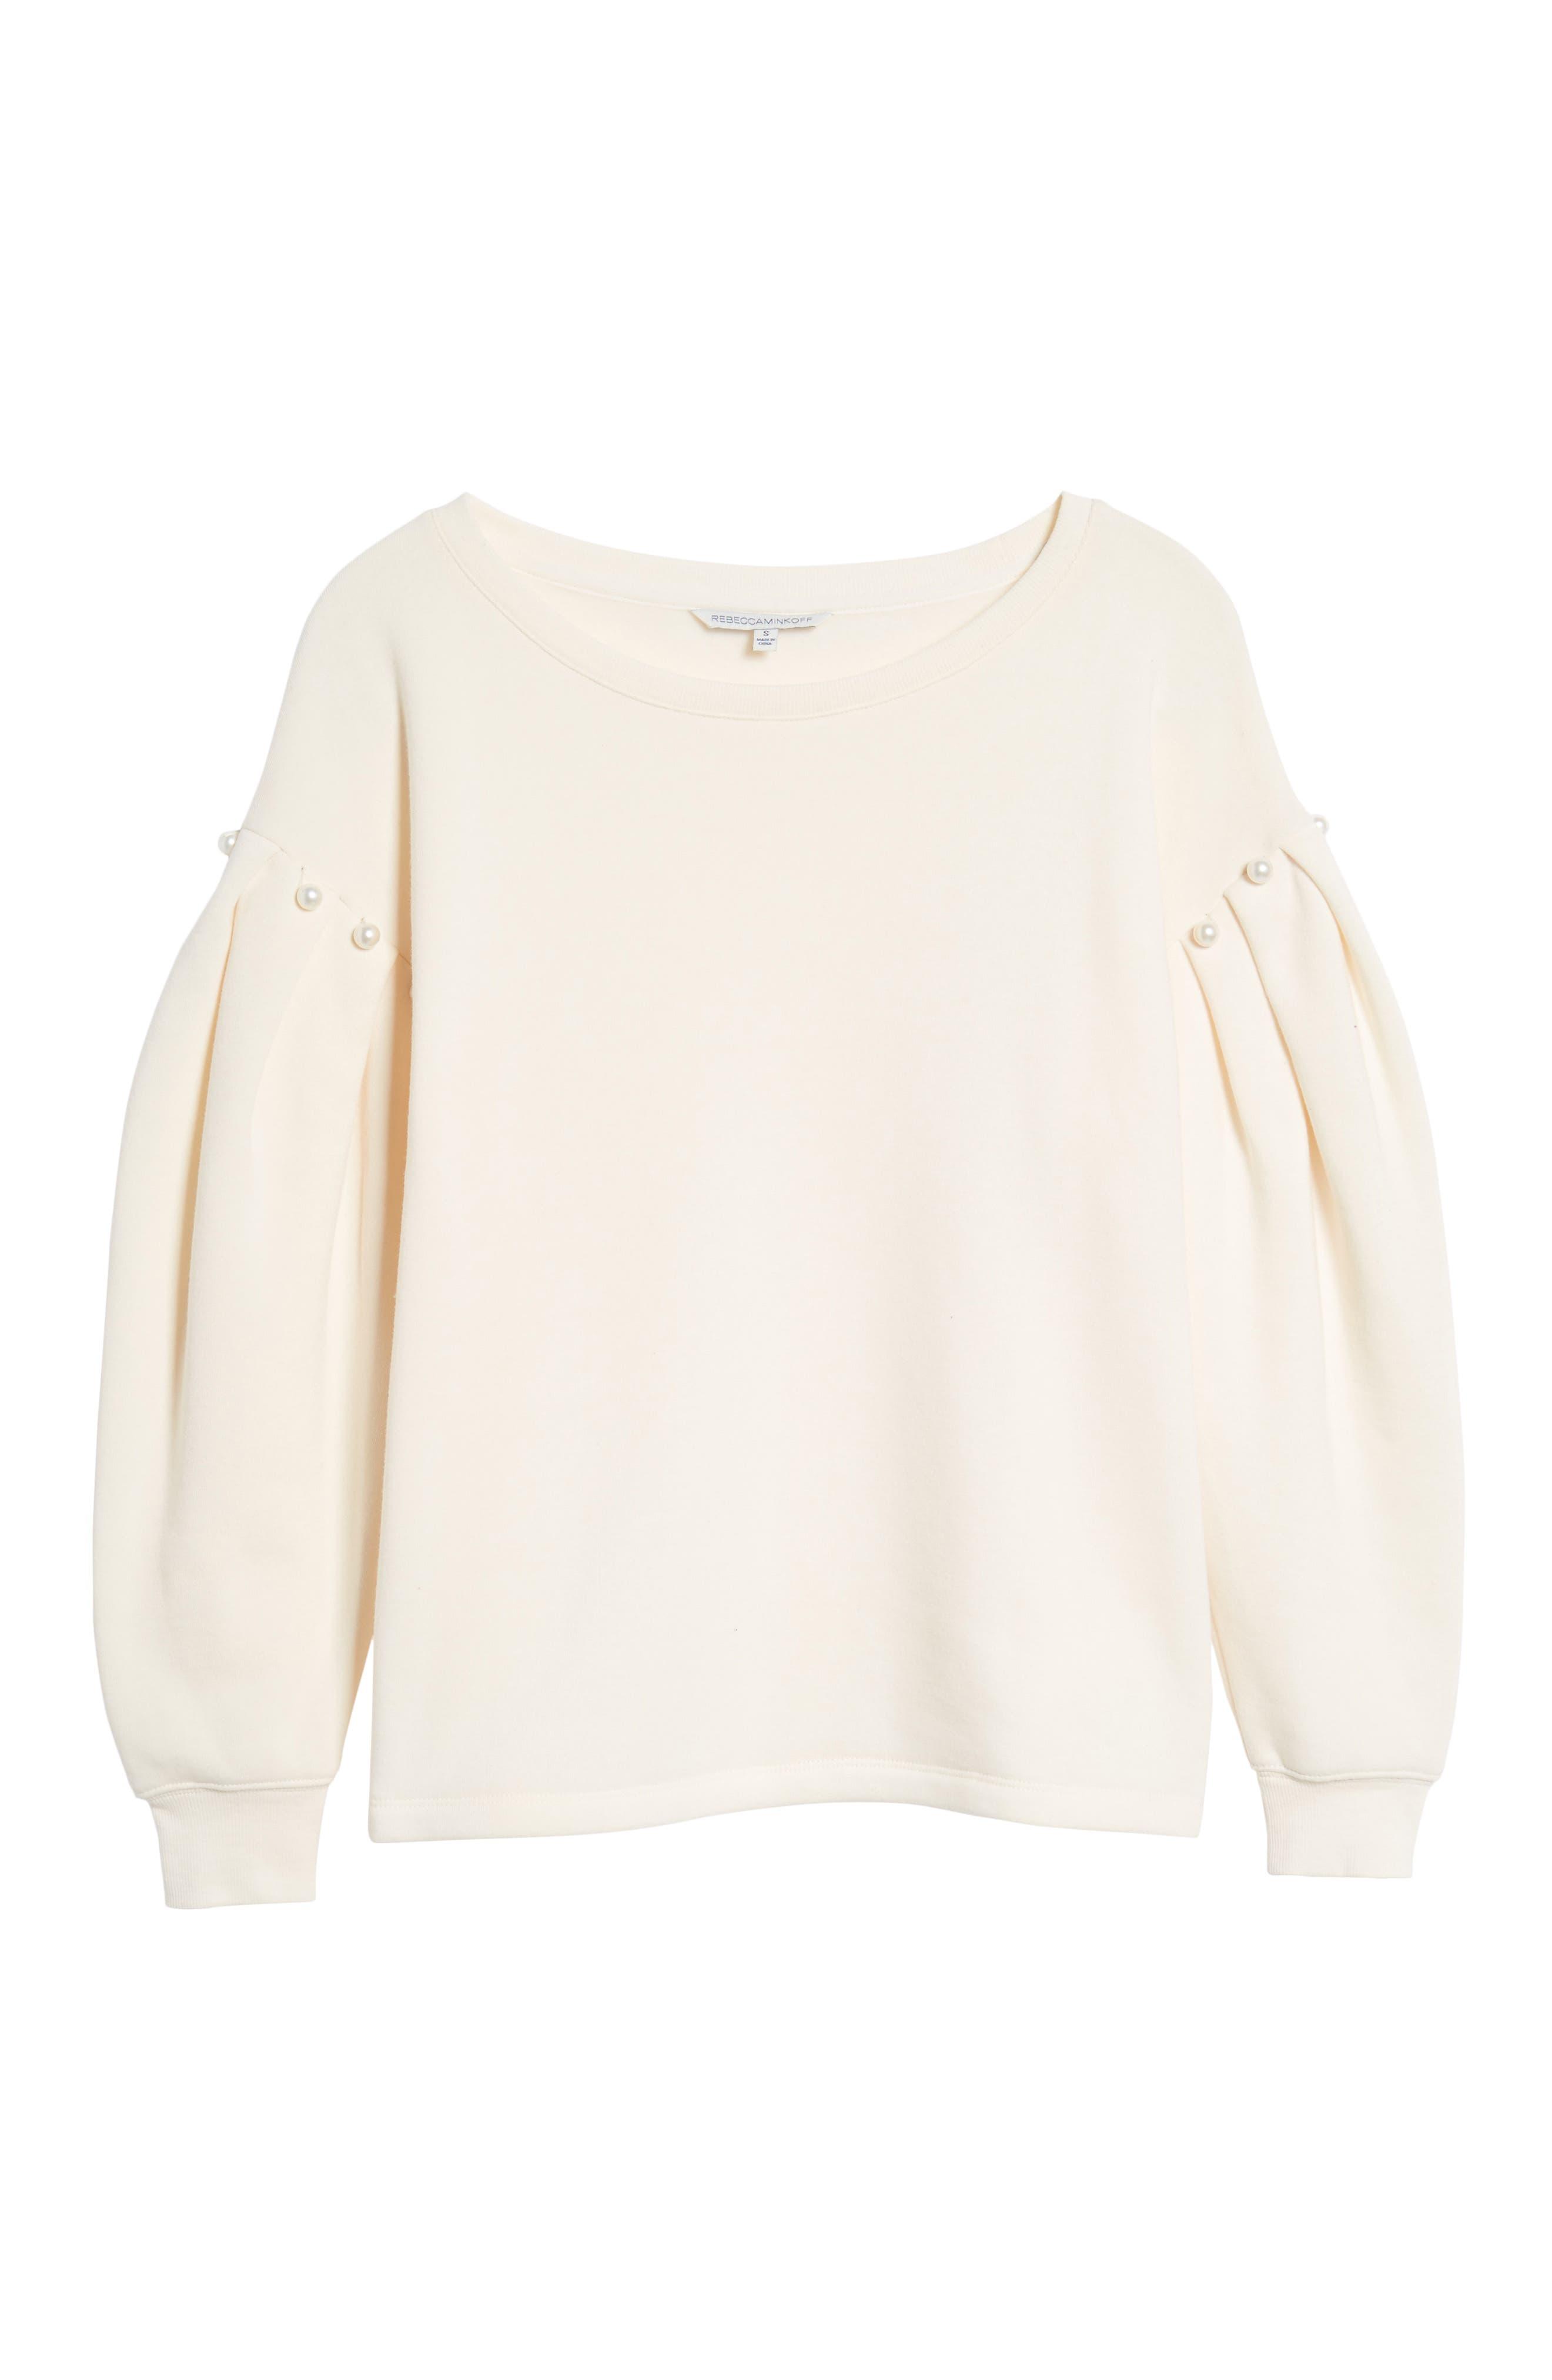 Ellison Sweatshirt,                             Alternate thumbnail 6, color,                             Off White